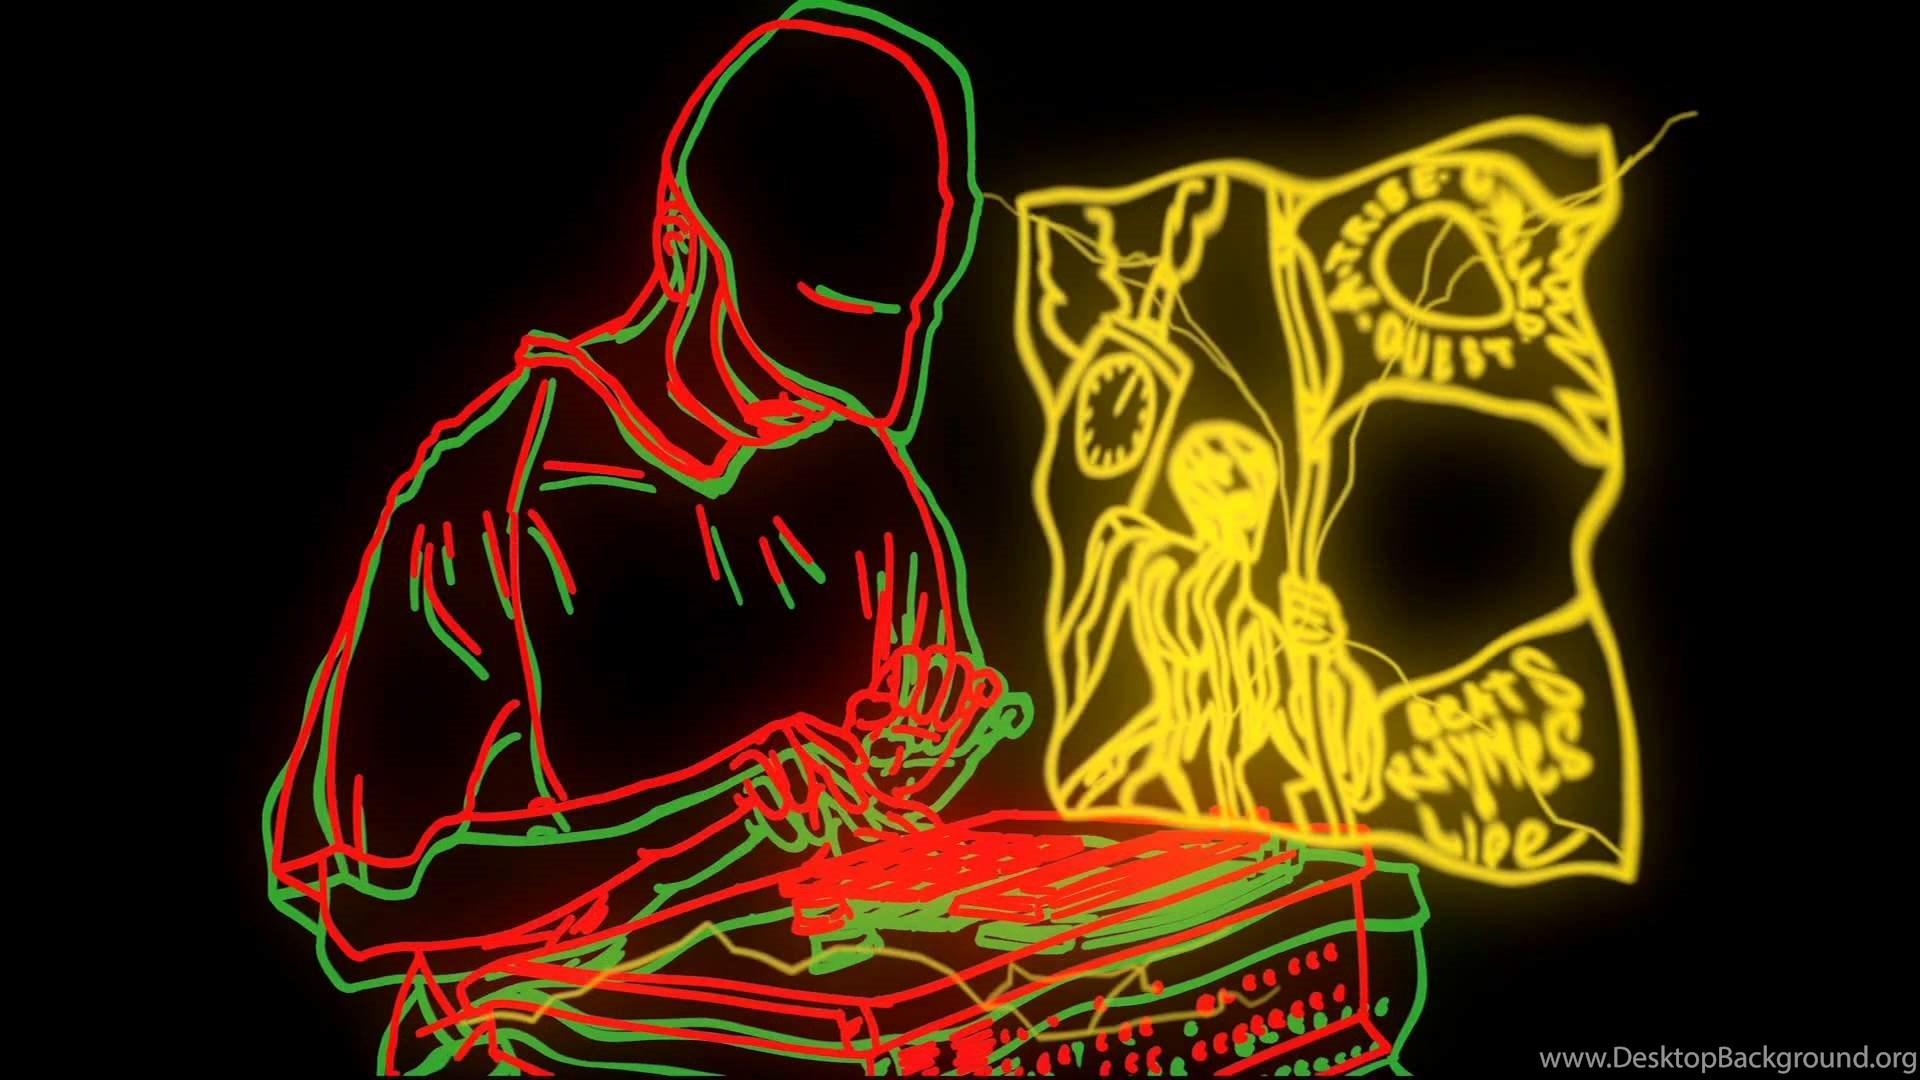 Phife Dawg Dear Dilla J Dilla A Tribe Called Quest Youtube